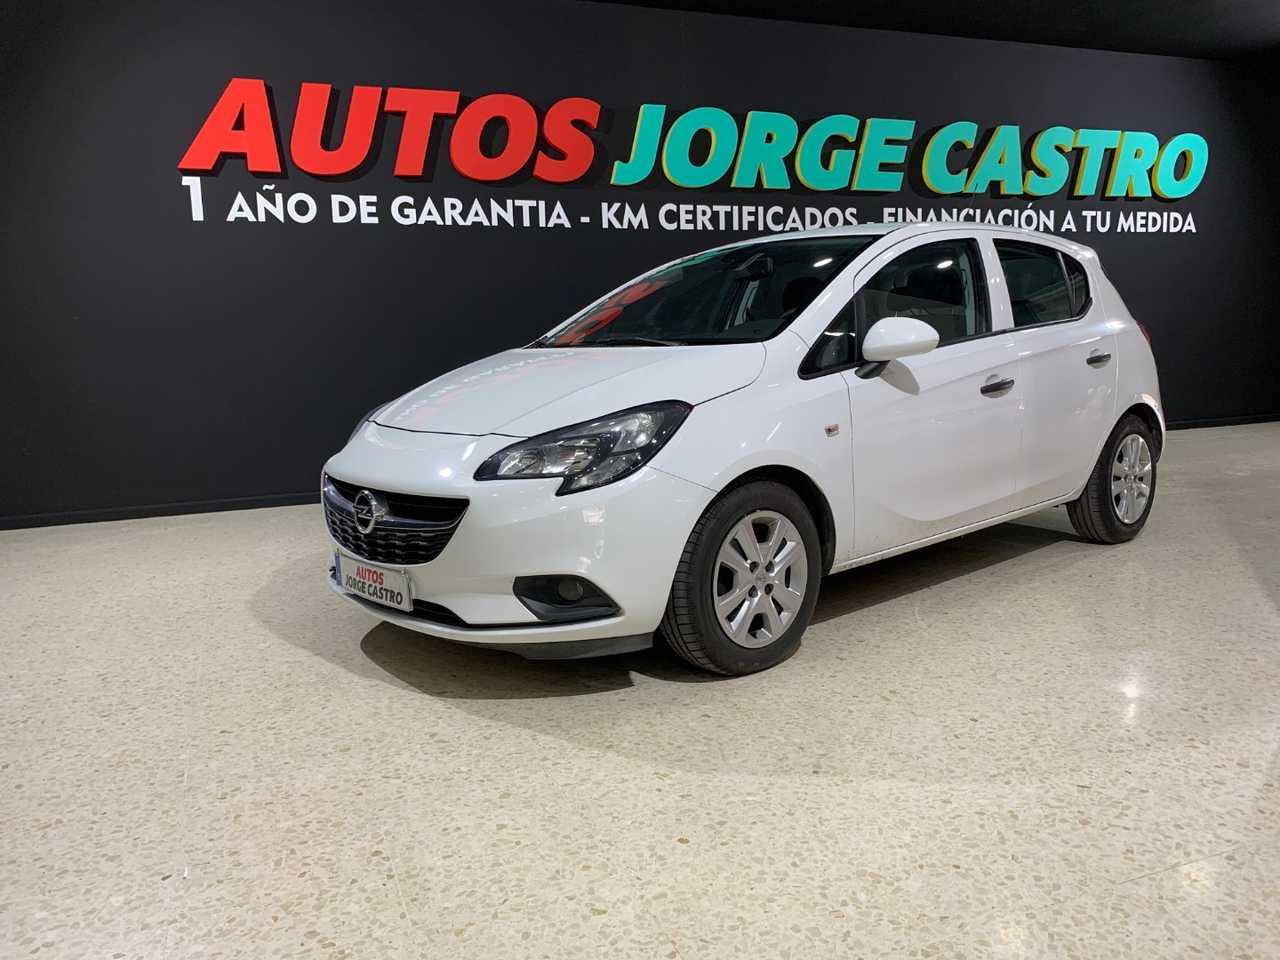 Opel Corsa 1.4 expression 90cv   - Foto 1